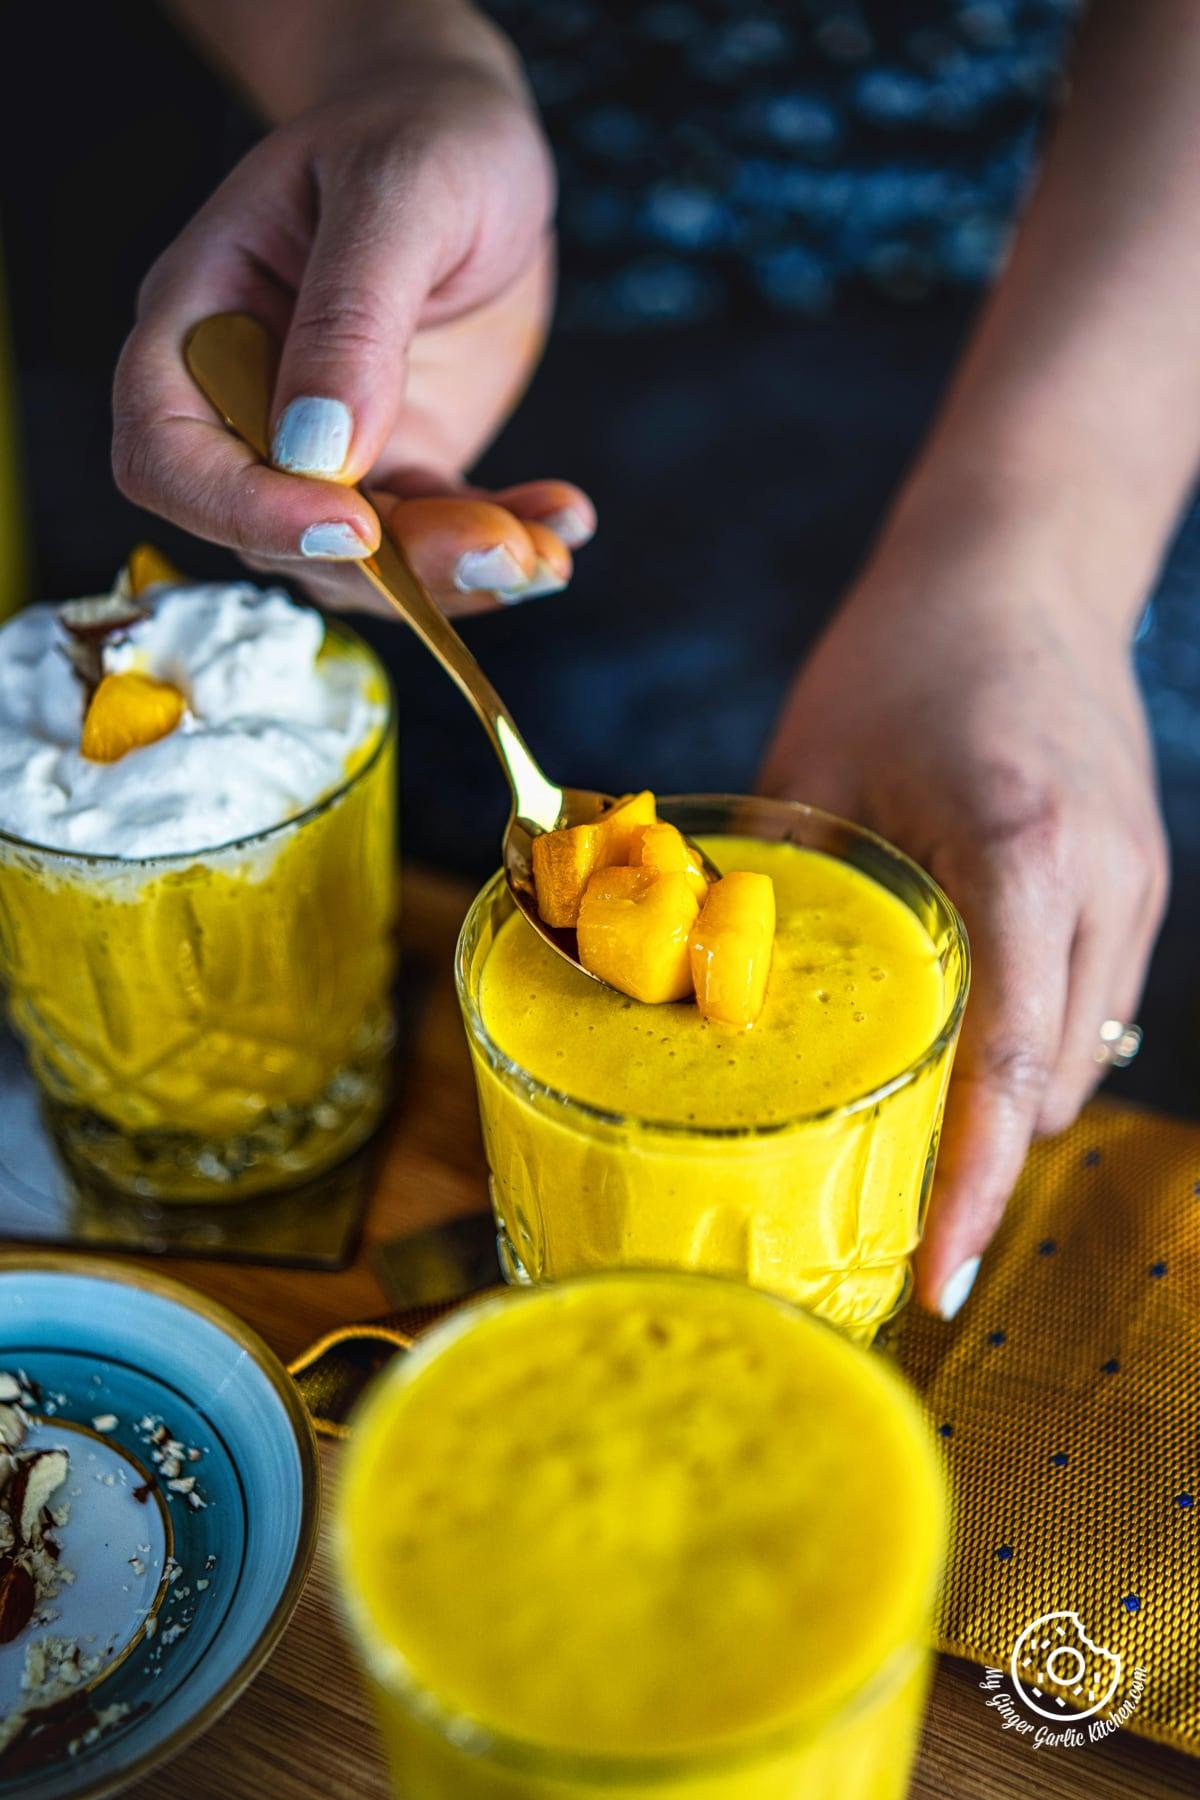 a female hand holding a spoon with chopped mangoes on a mango milkshake glass